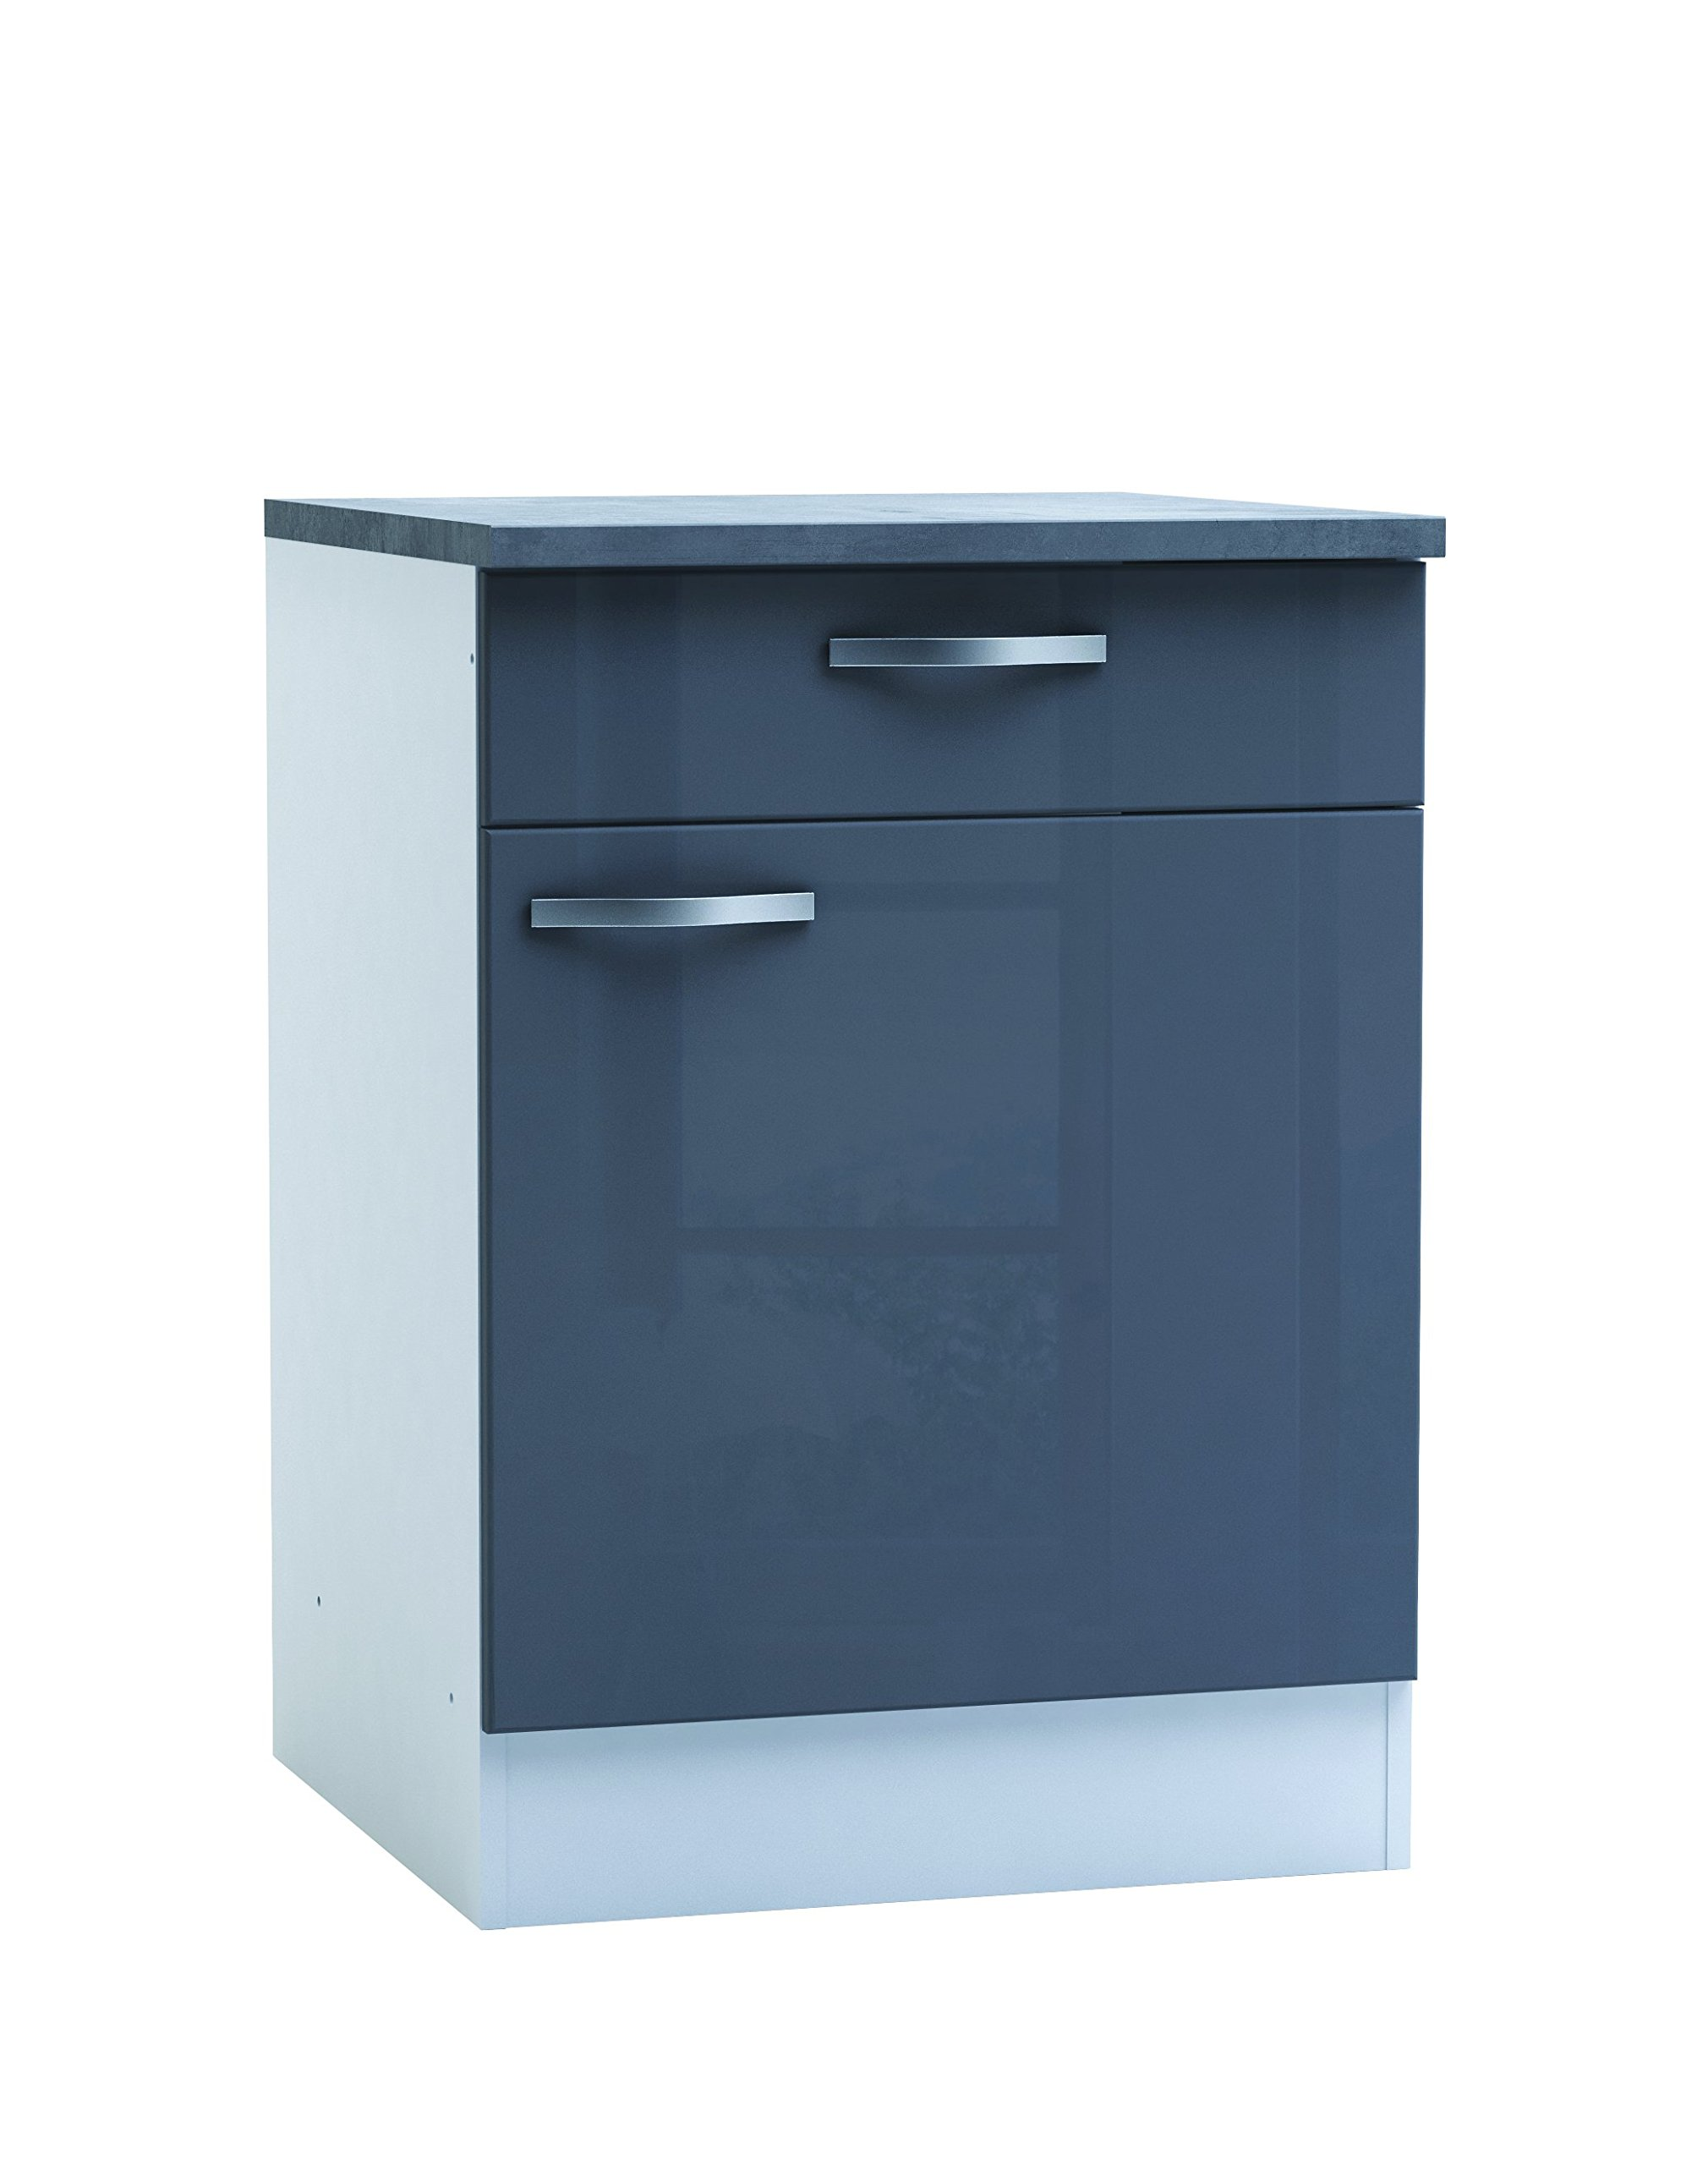 Generic Kitchen 1Door/1Drawer Base Cabinet 60cm Glossy Grey